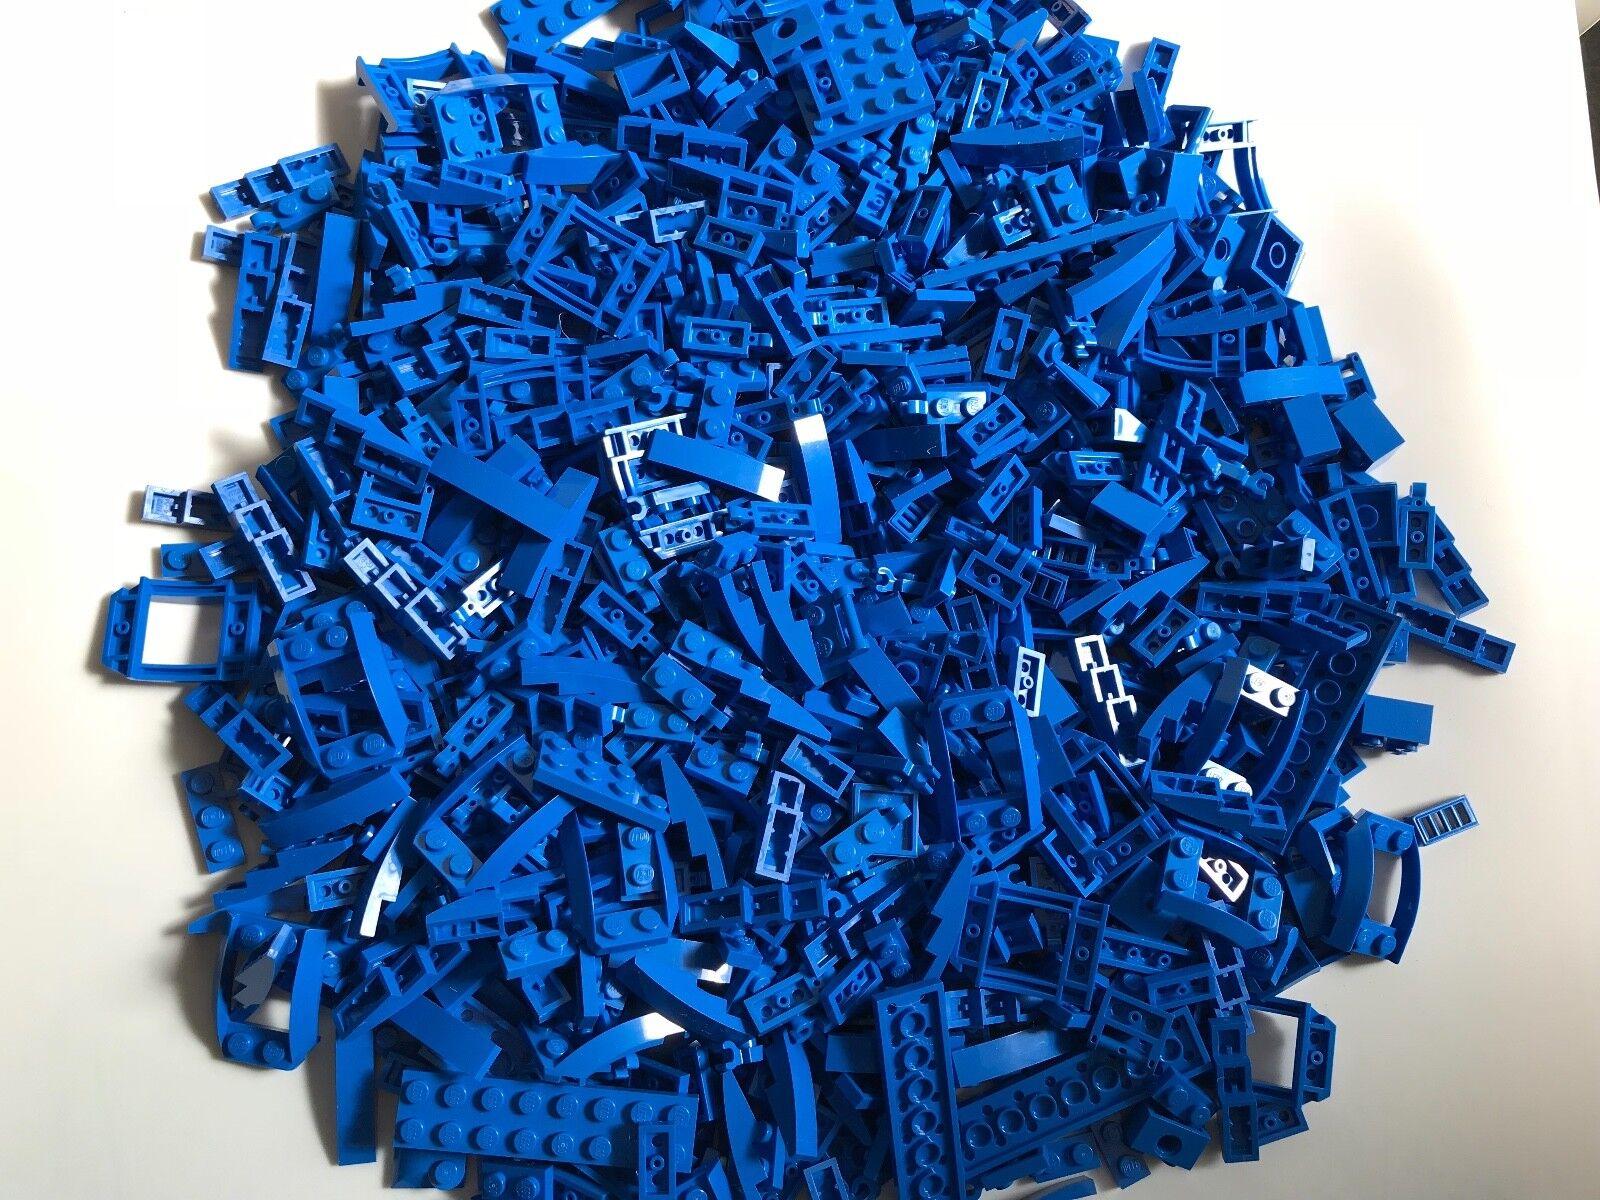 600g LEGO PARTS Blau small rare finishing parts STAR WARS CITY BATMAN MARVEL